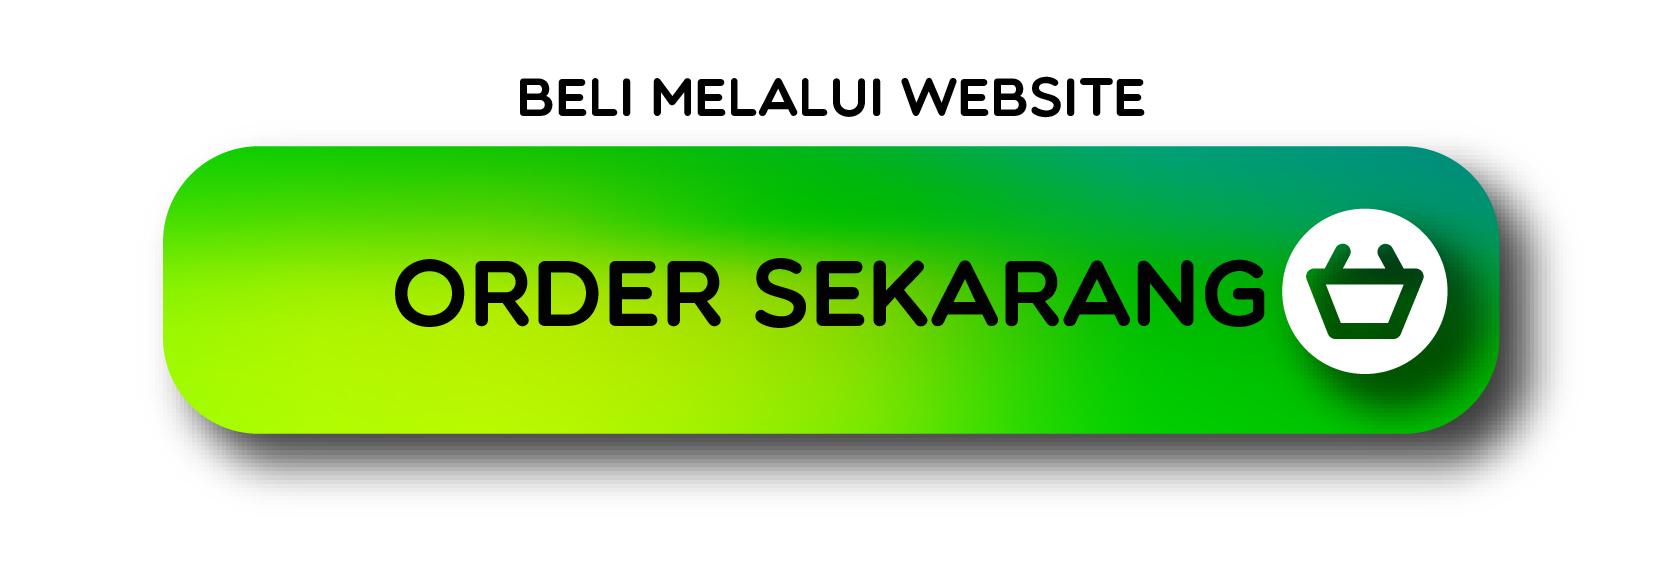 BELI MELALUI WEBSITE-01.jpg